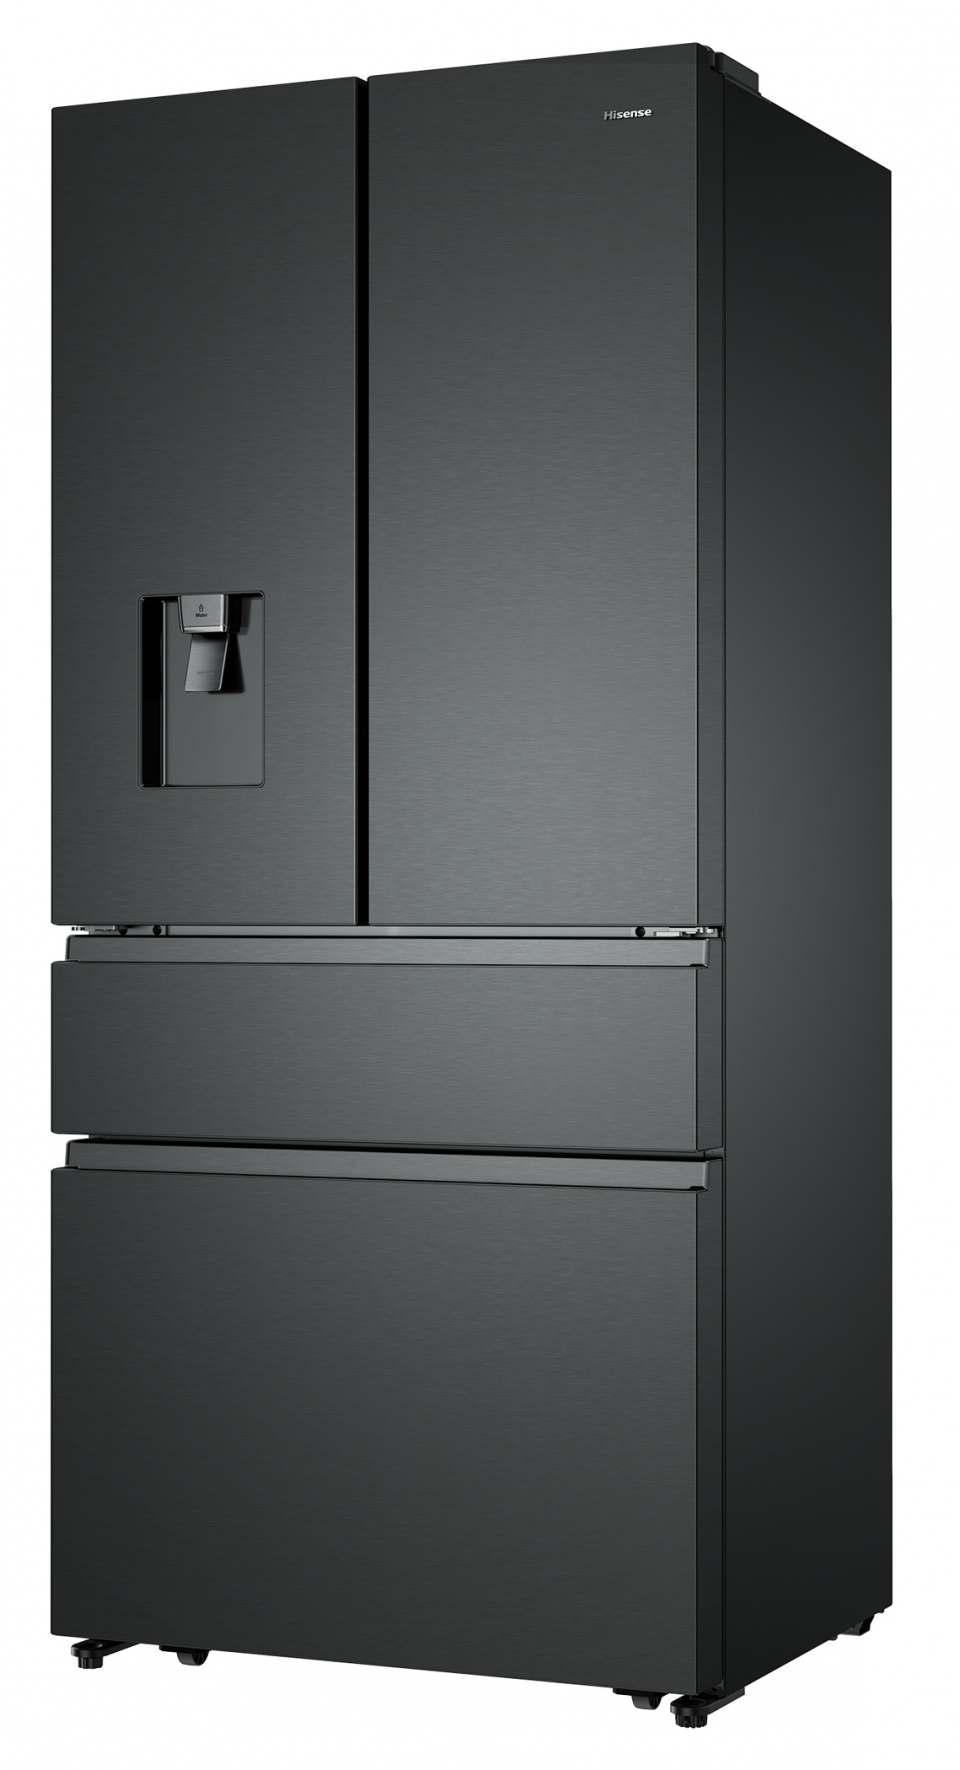 Hisense Kühl-/Gefrierkombination BCD 486 W mit Dual-Tech Cooling.